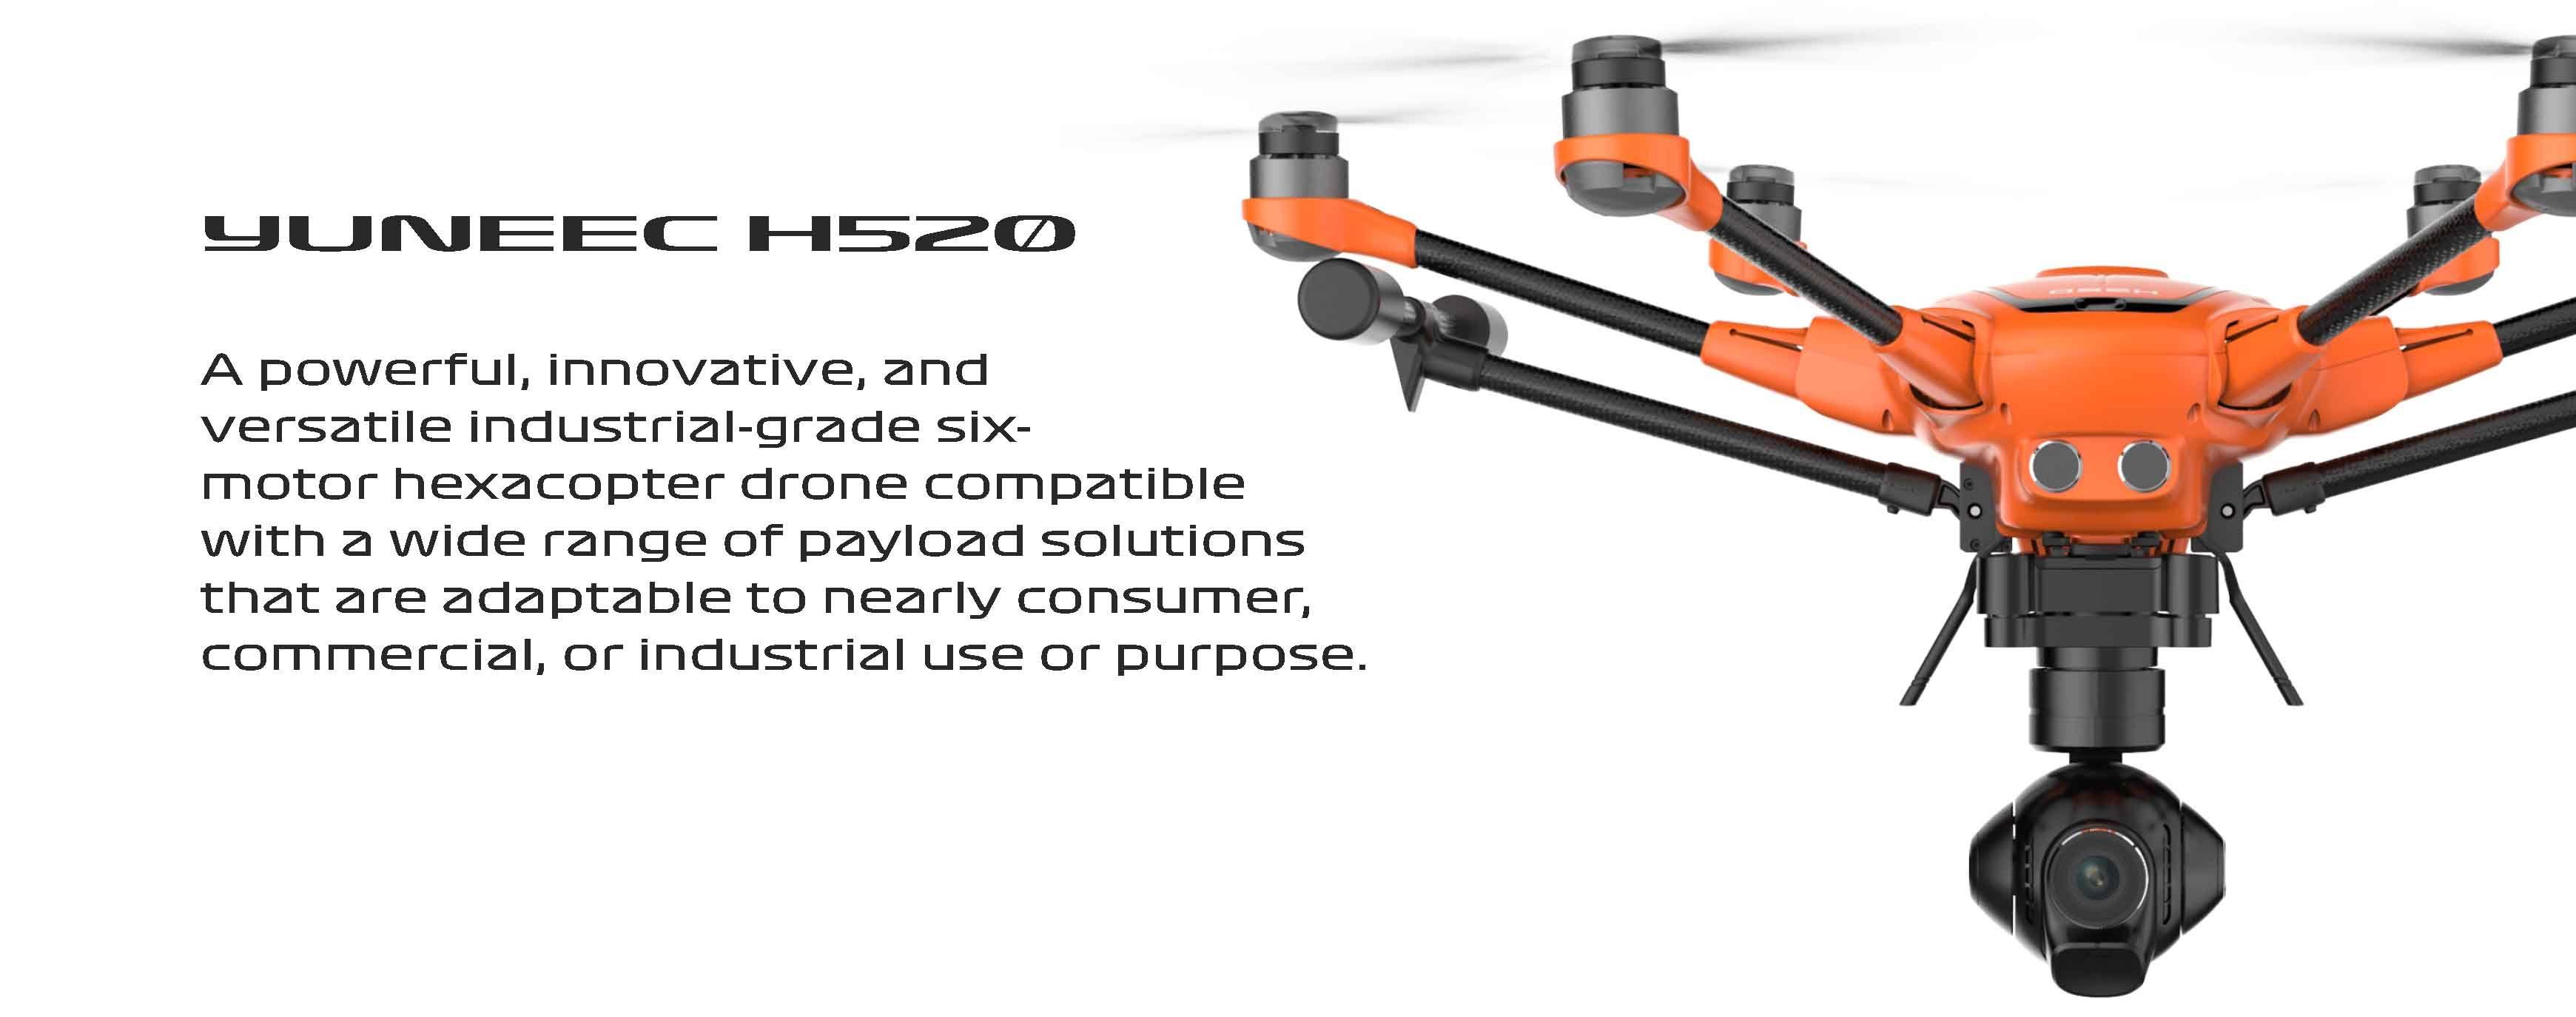 dronesforsaleyuneech520droneskynexdrones.jpg